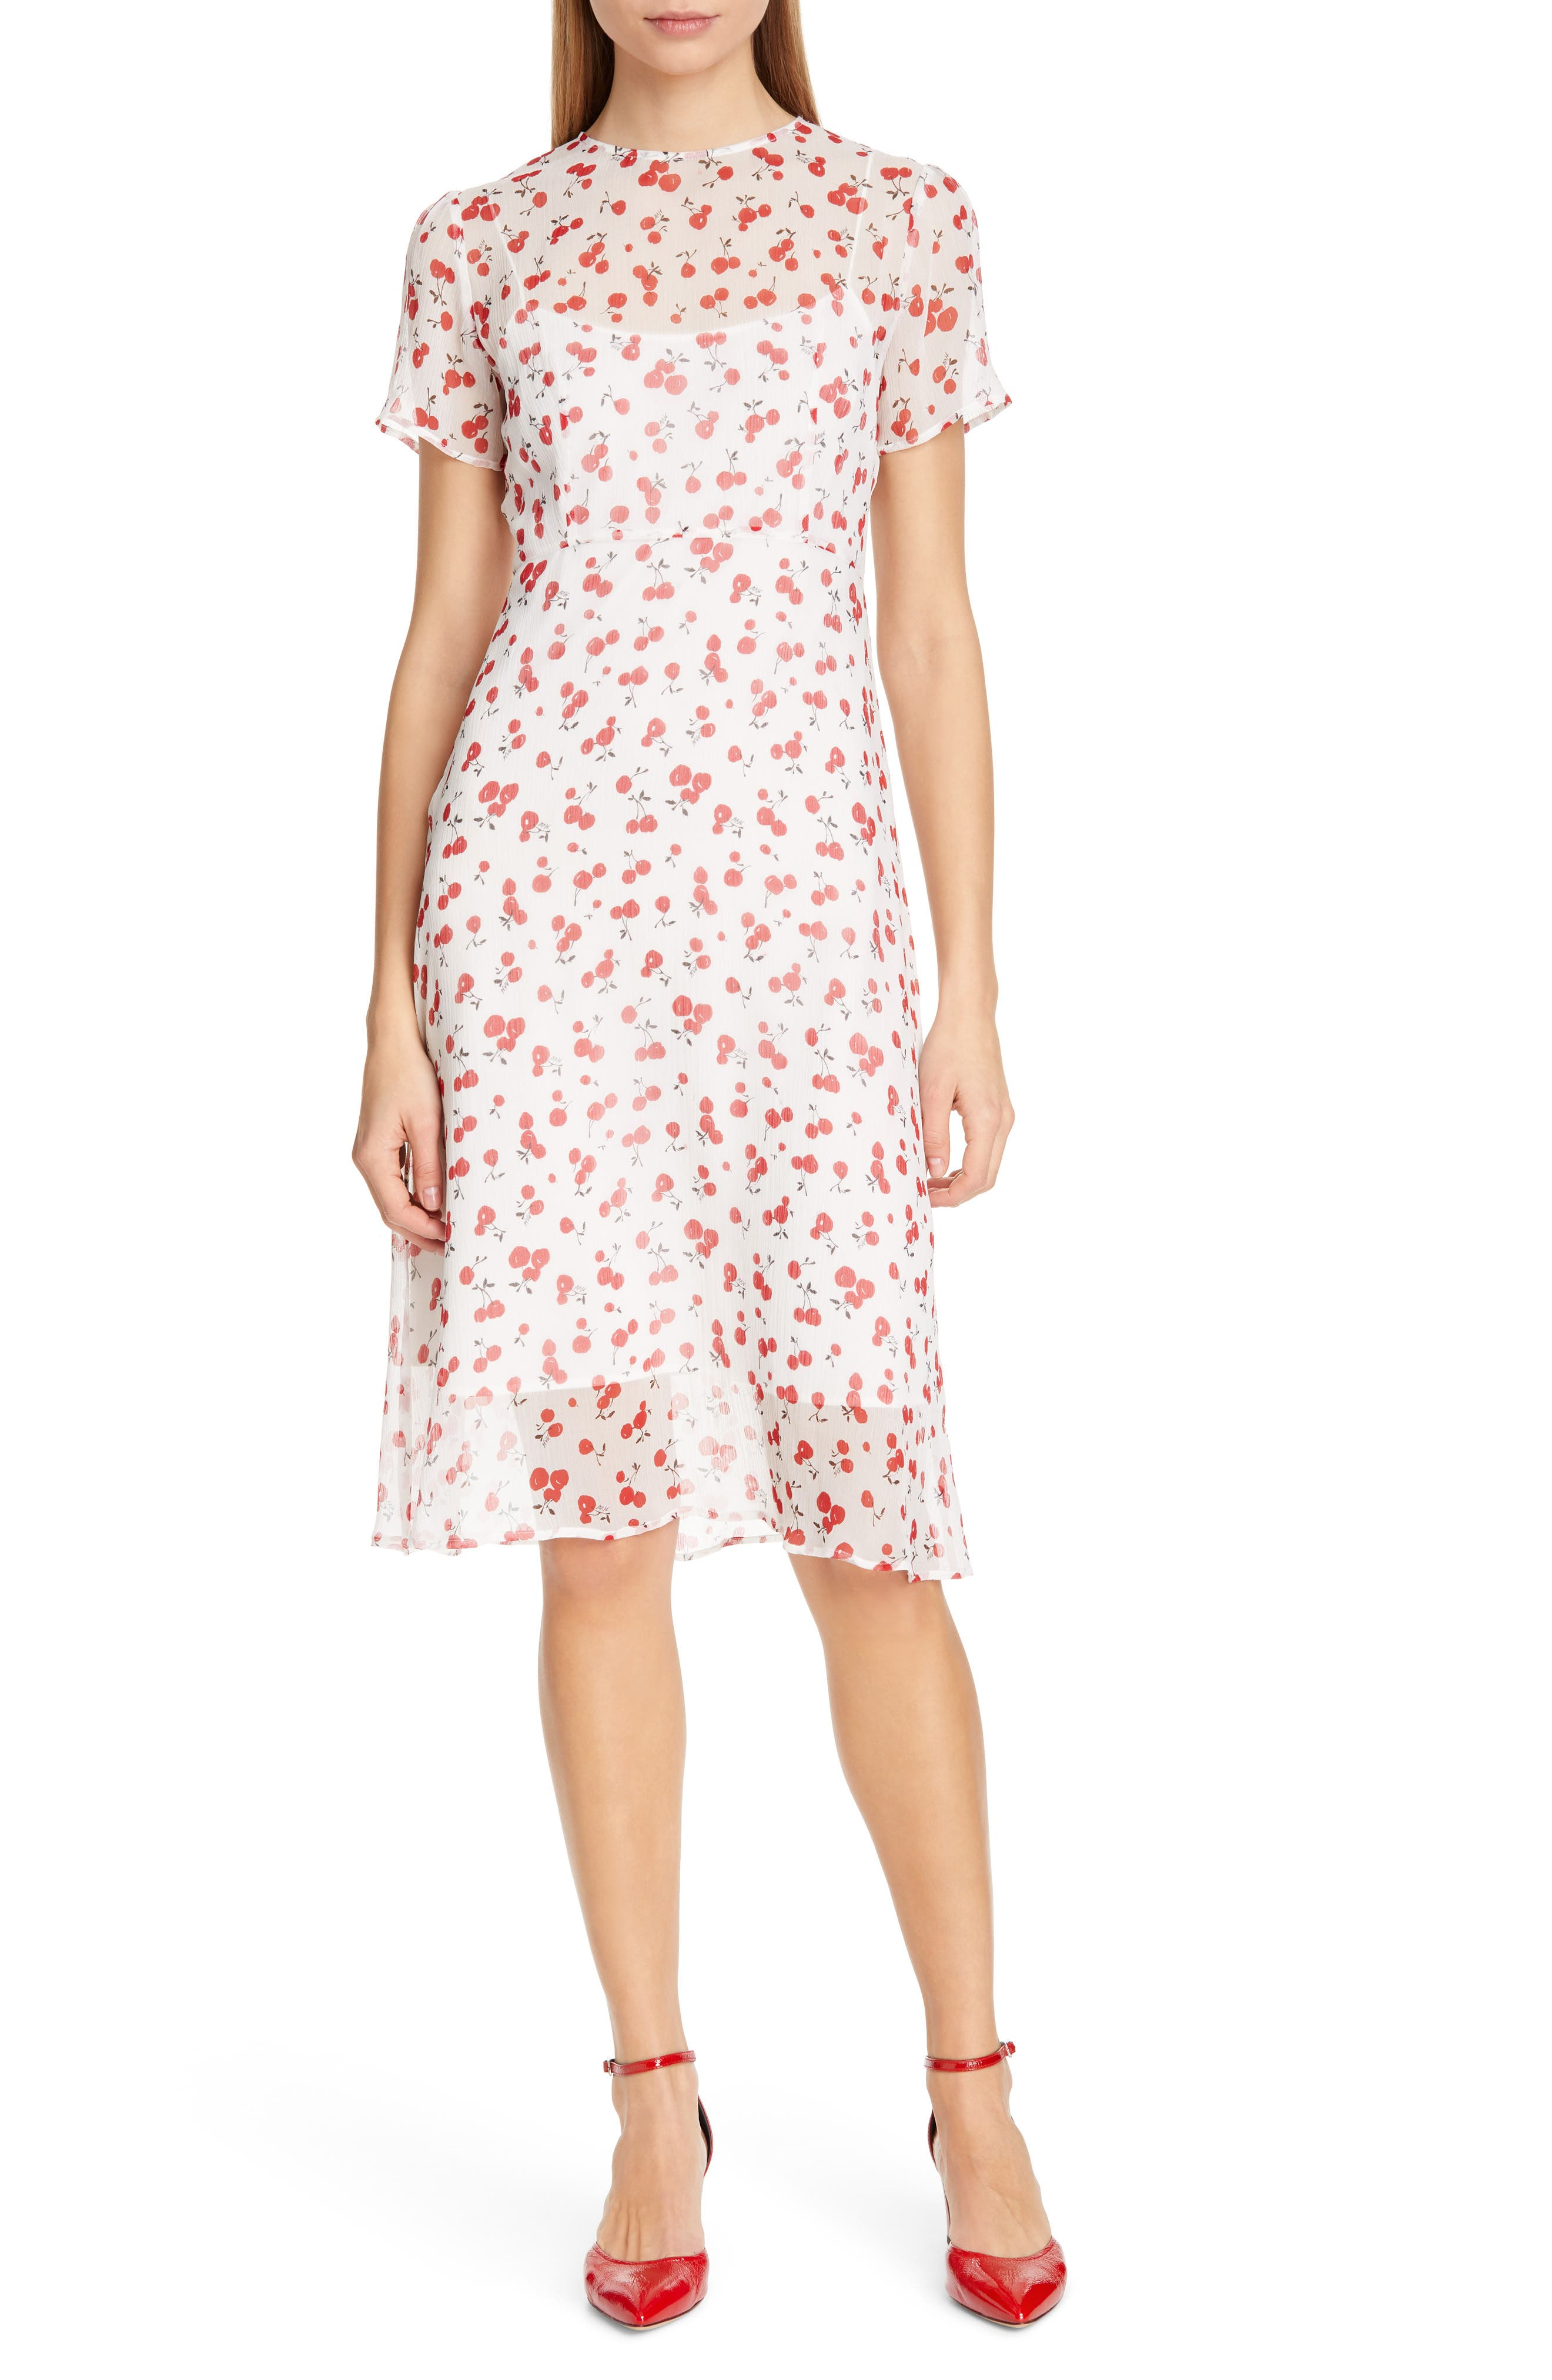 Hvn Lindy Cherry Print Silk Chiffon Dress, White